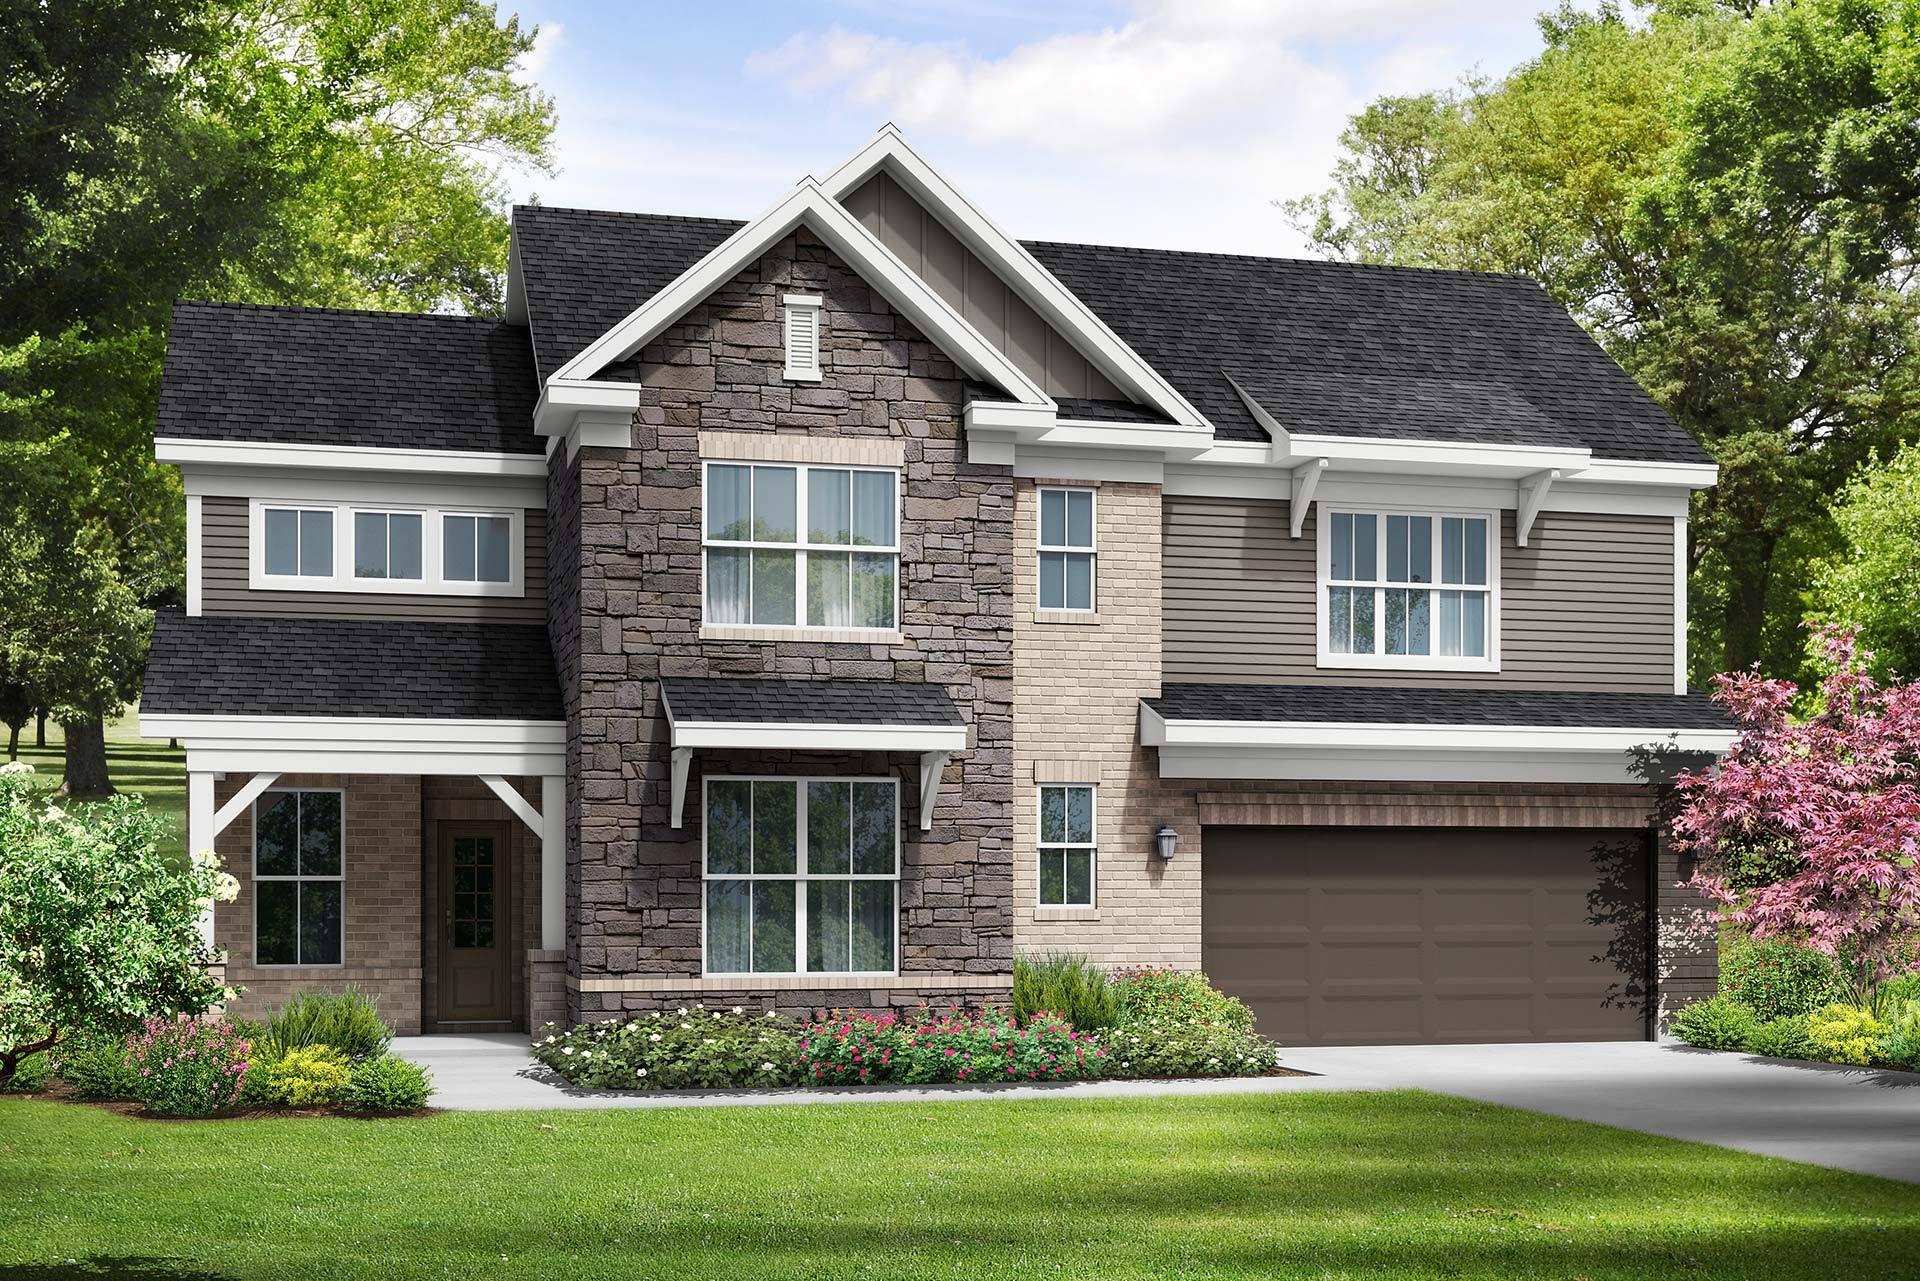 http://partners-dynamic.bdxcdn.com/Images/Homes/DavidsonHomes/max1500_39400731-191121.jpg